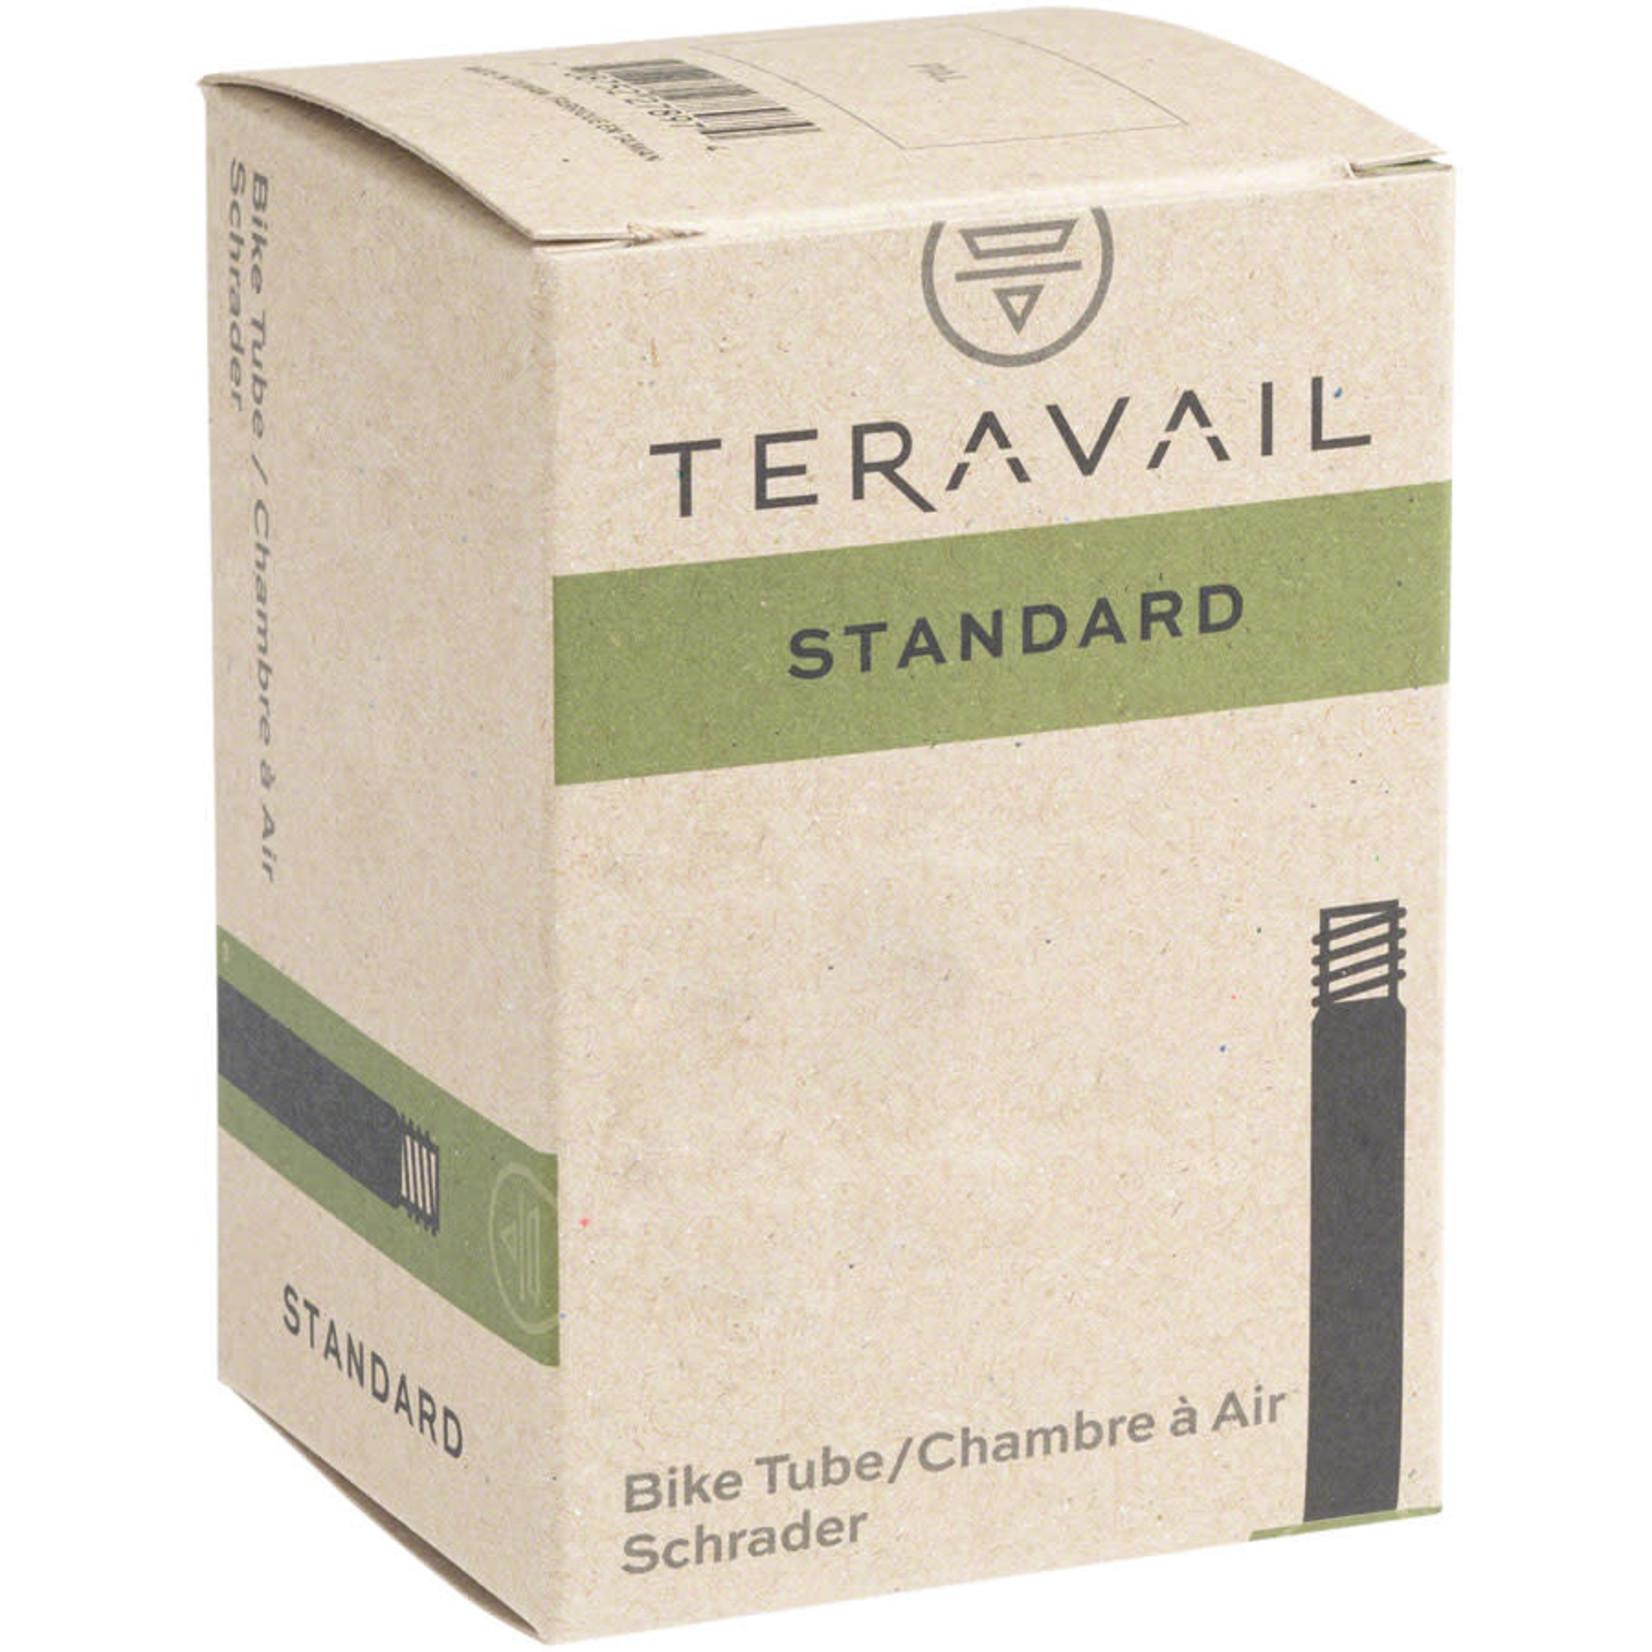 "Q-Tubes Q-Tubes / Teravail 20"" x 1.25-1.5"" Schrader Valve Tube 98g *Low Lead Valve*"